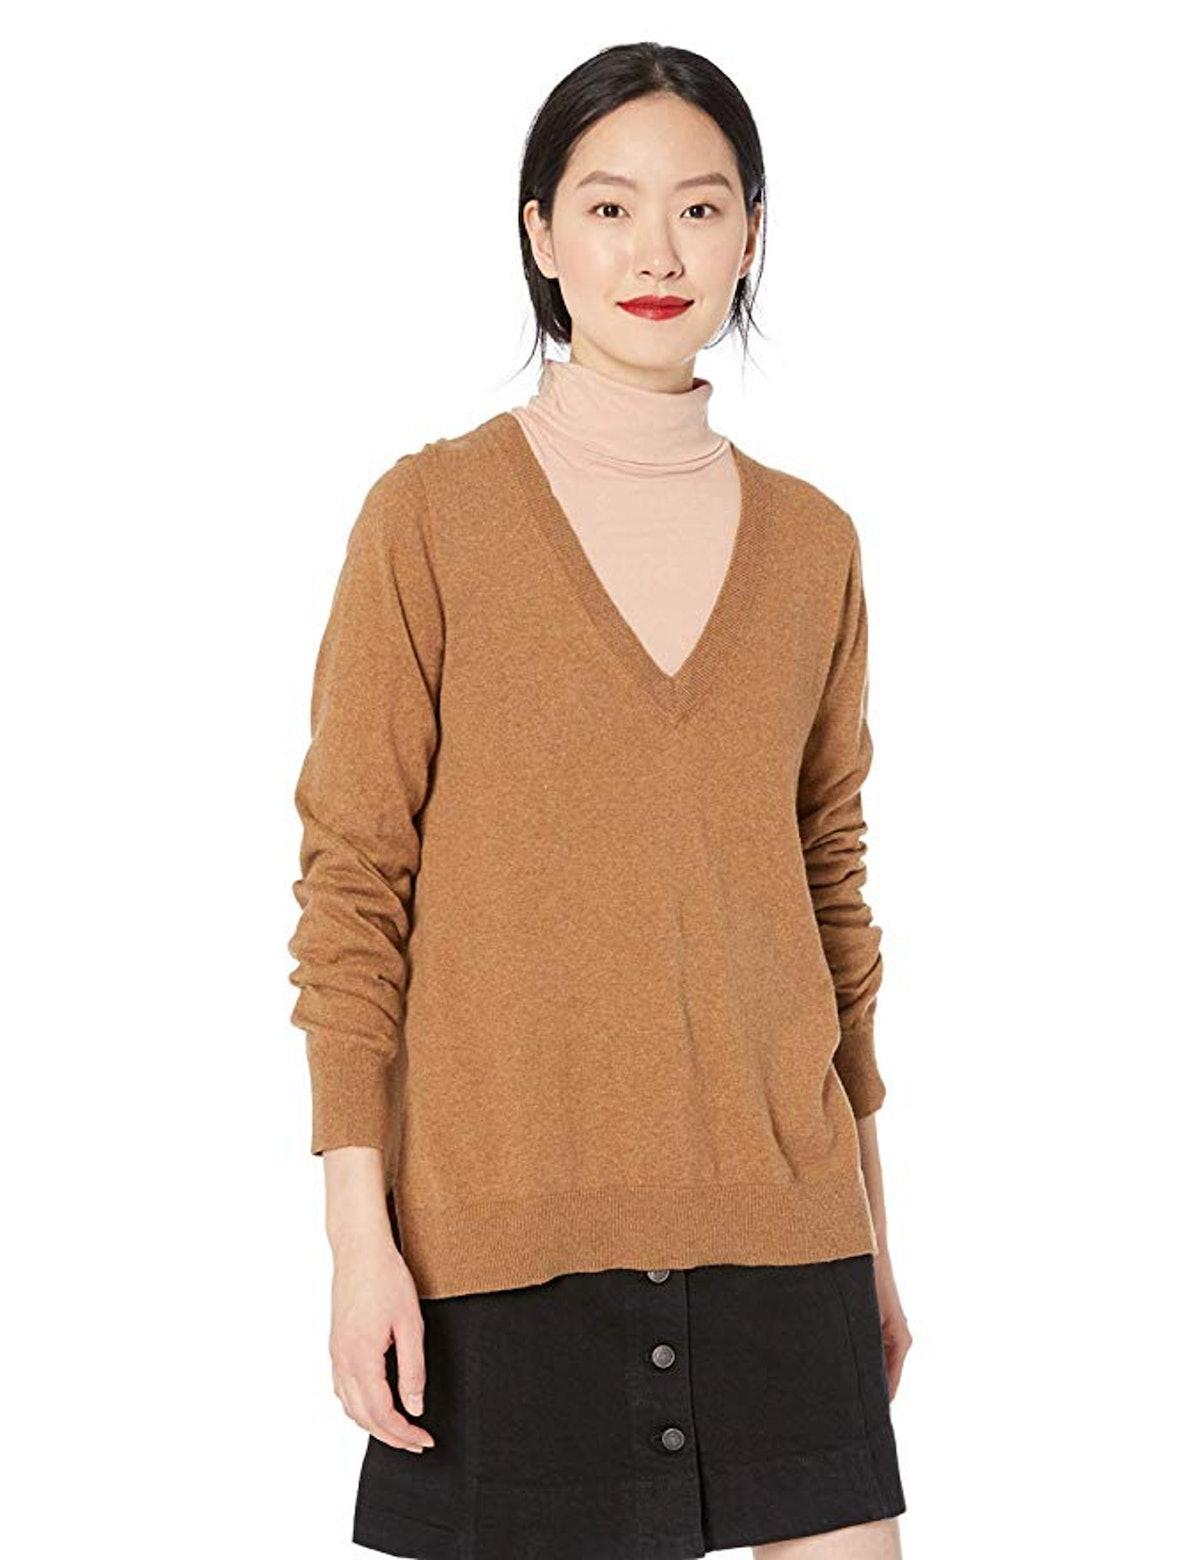 J.Crew Mercantile Women's Cotton V-Neck Sweater